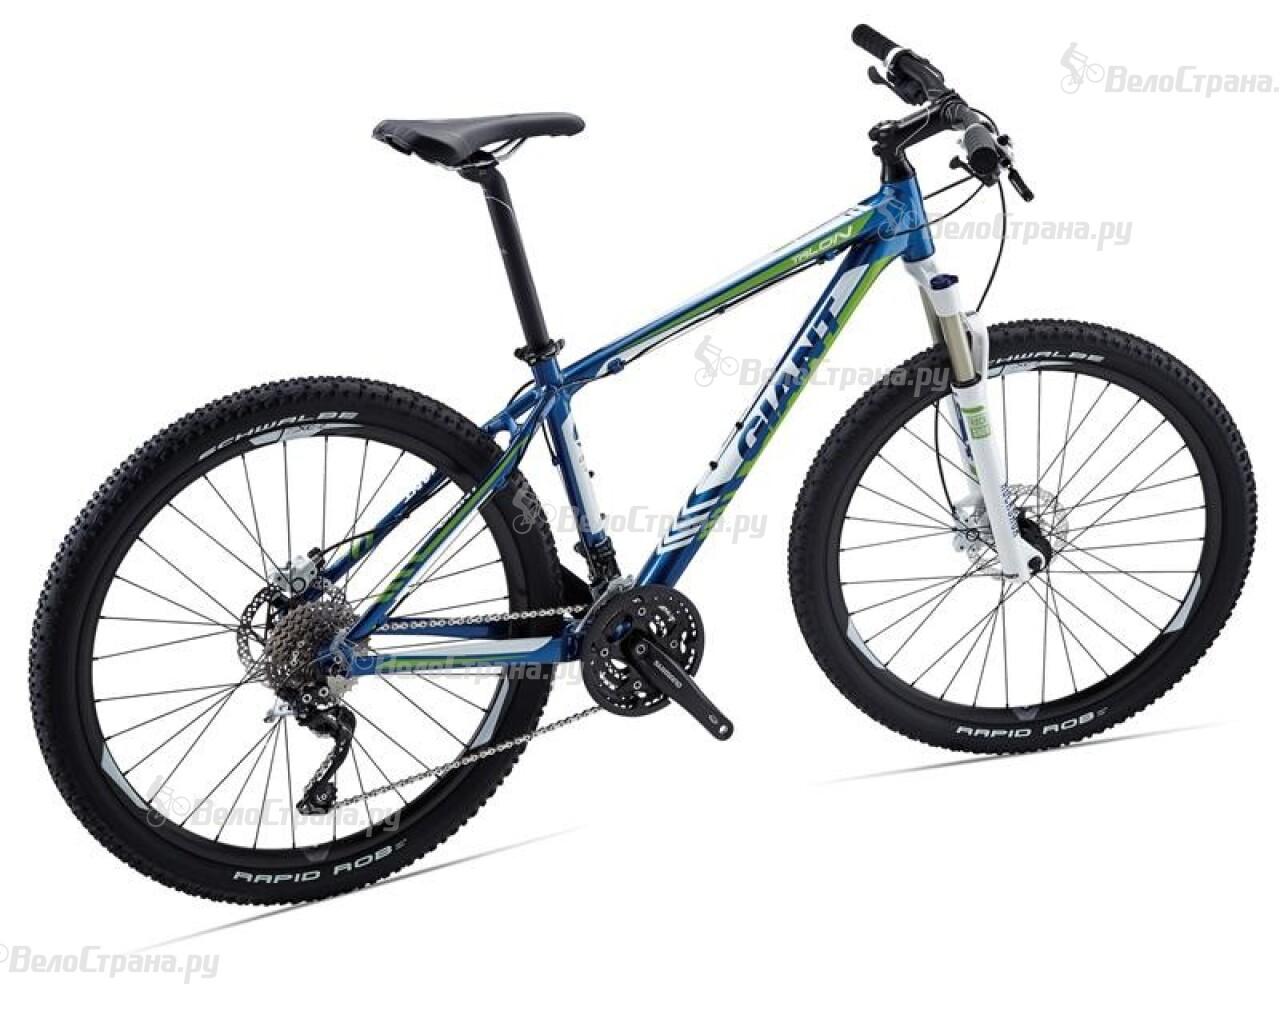 Велосипед Giant Talon 27.5 1 (2015)